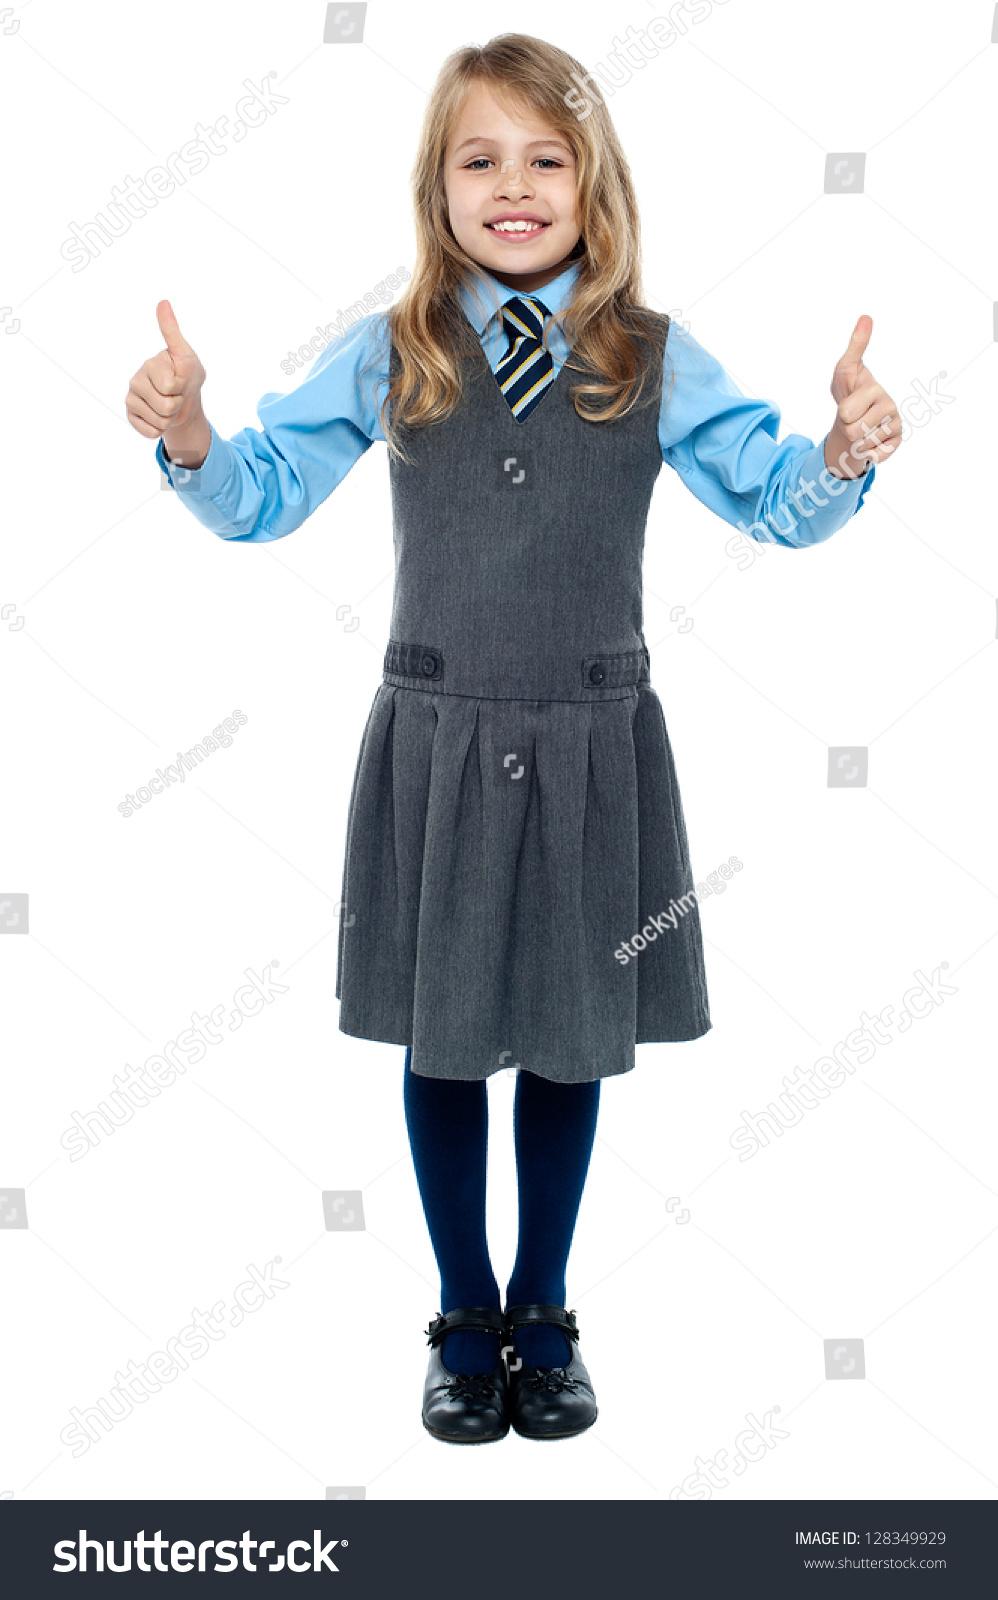 Uniform thumbs